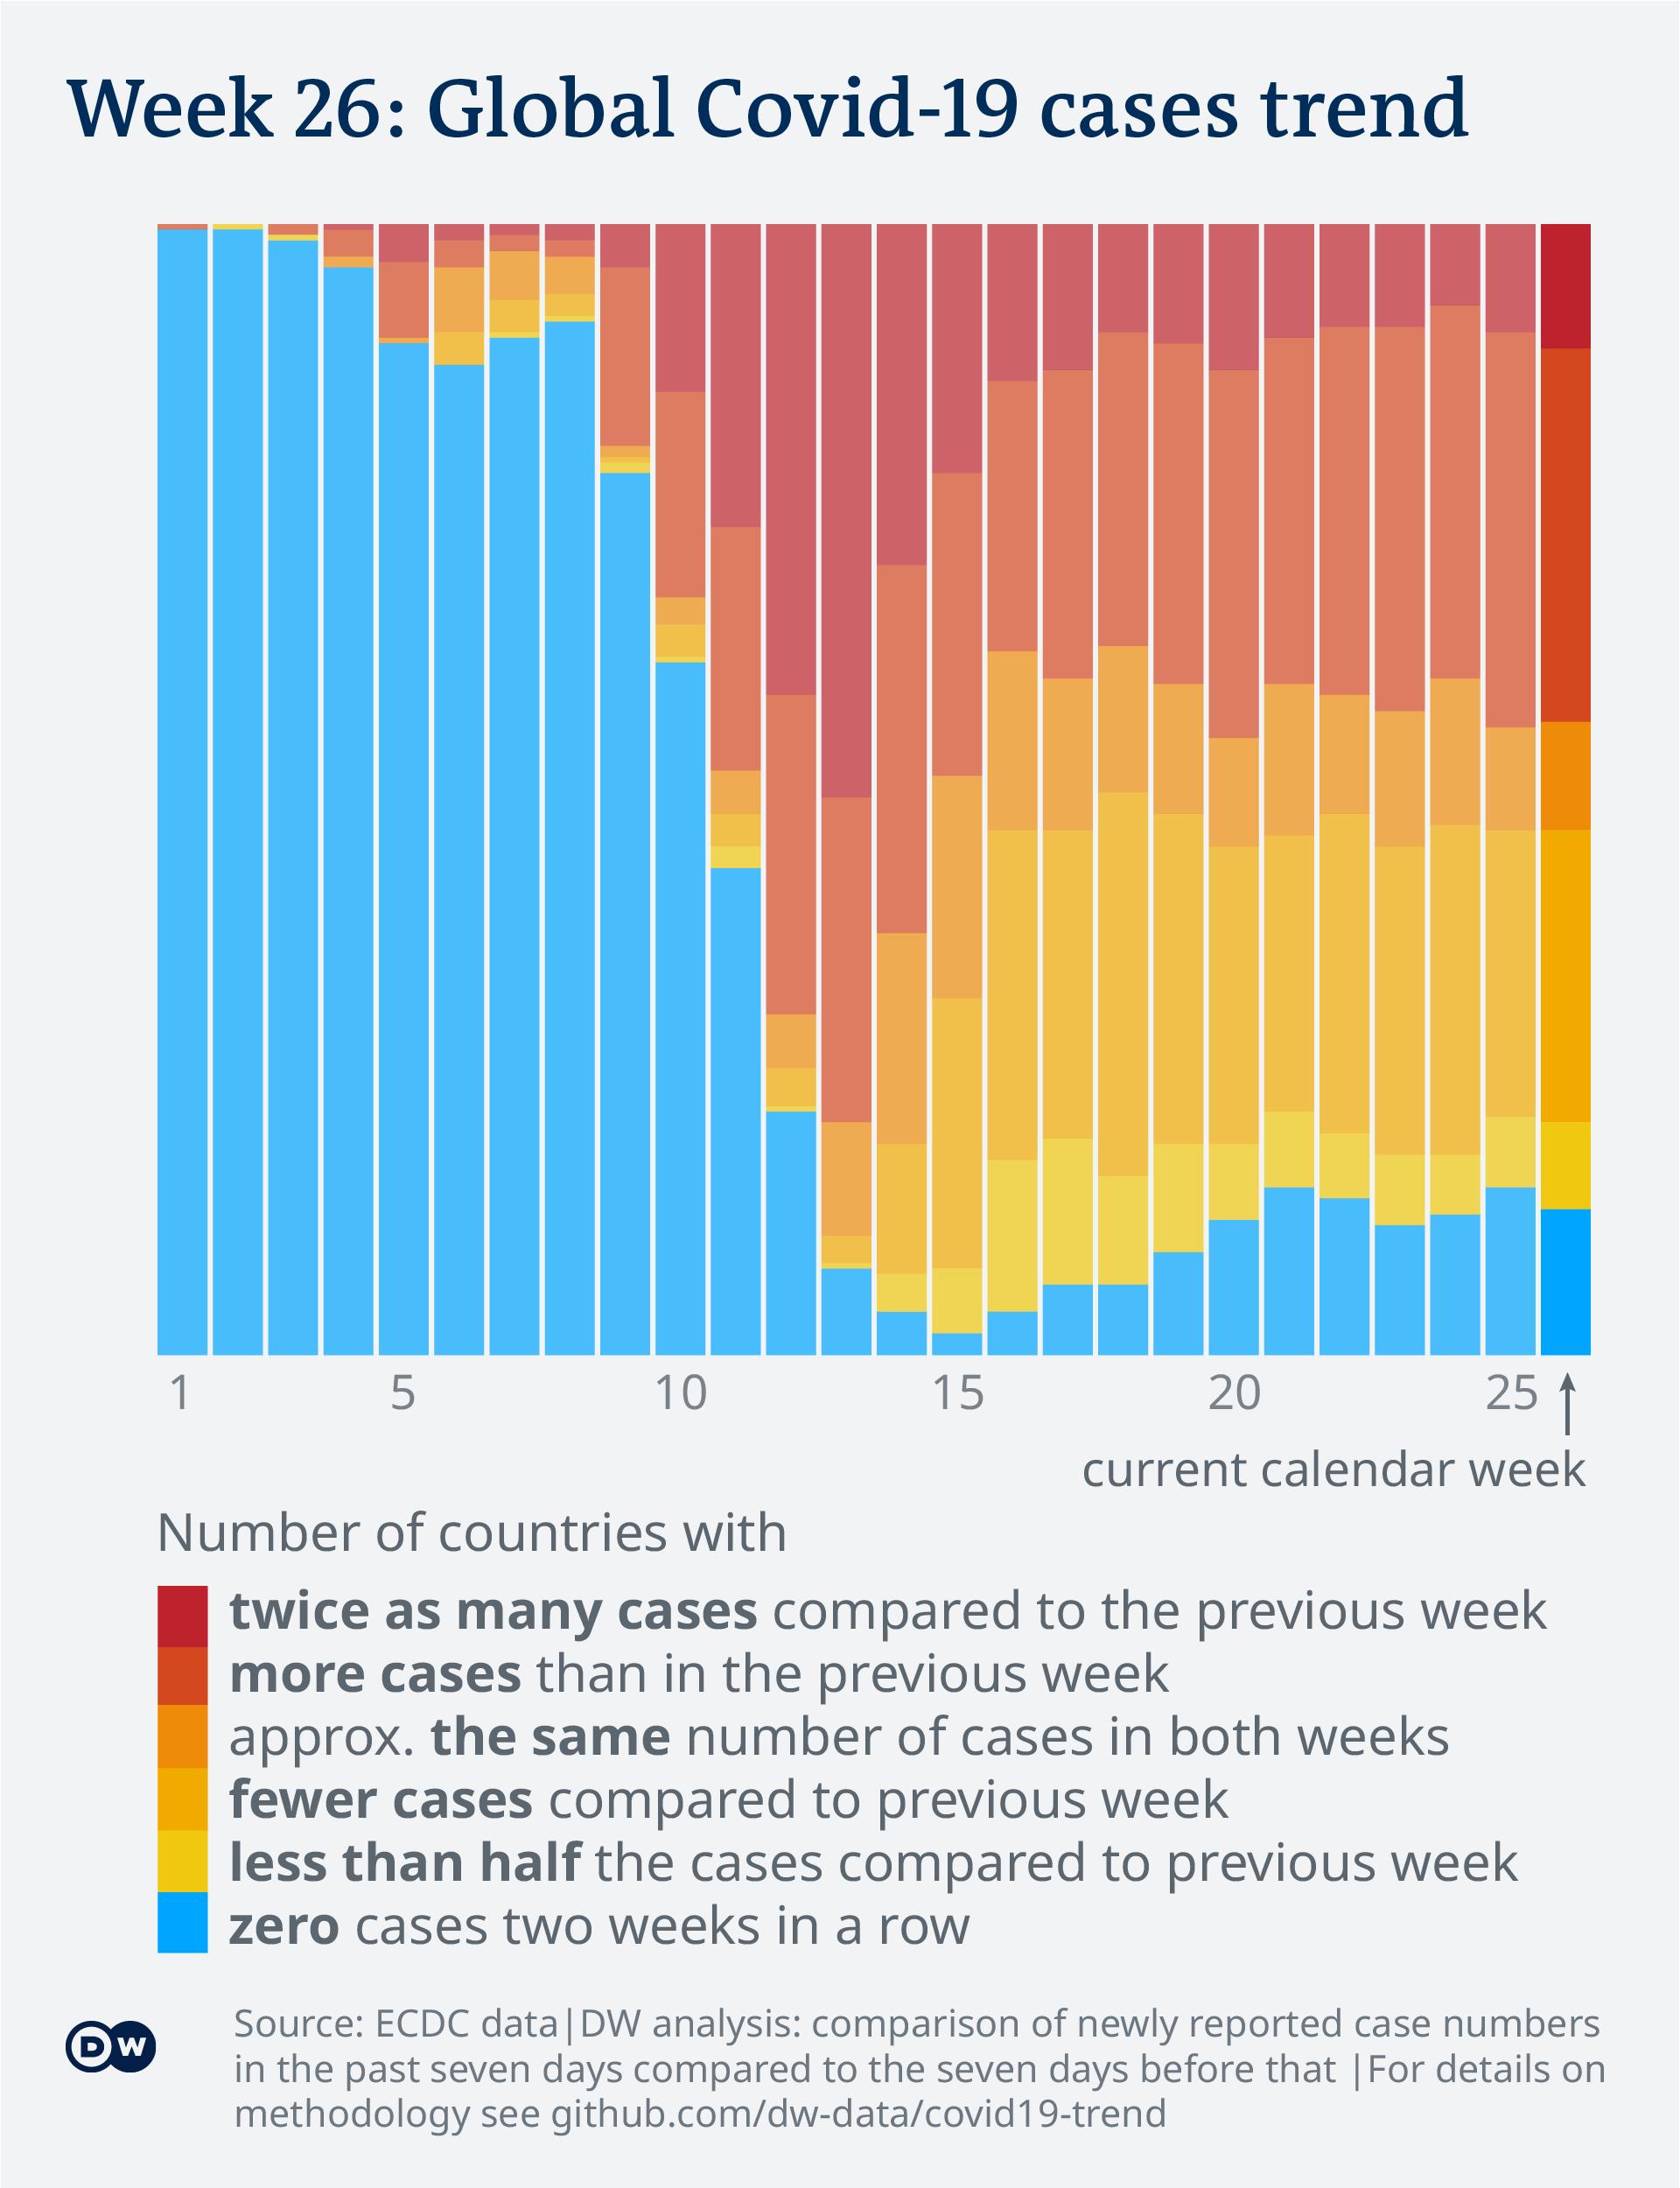 Data visualization: Covid-19 global case numbers trend - until calendar week 26